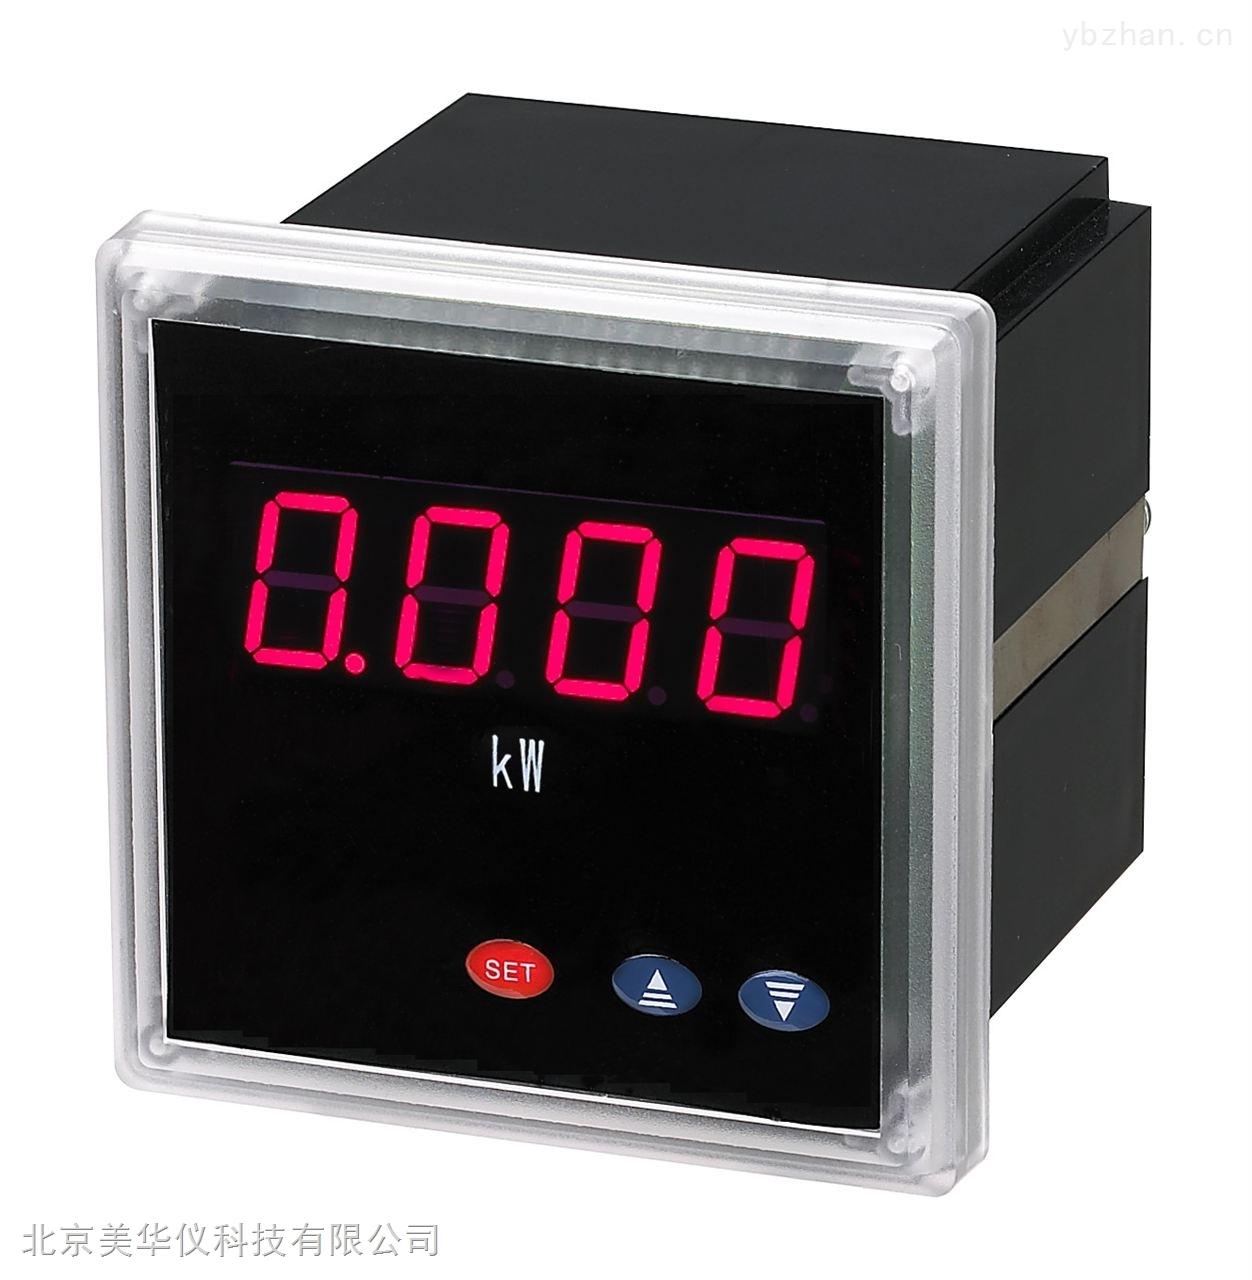 mhy-9047-功率因数表.-北京美华仪科技有限公司